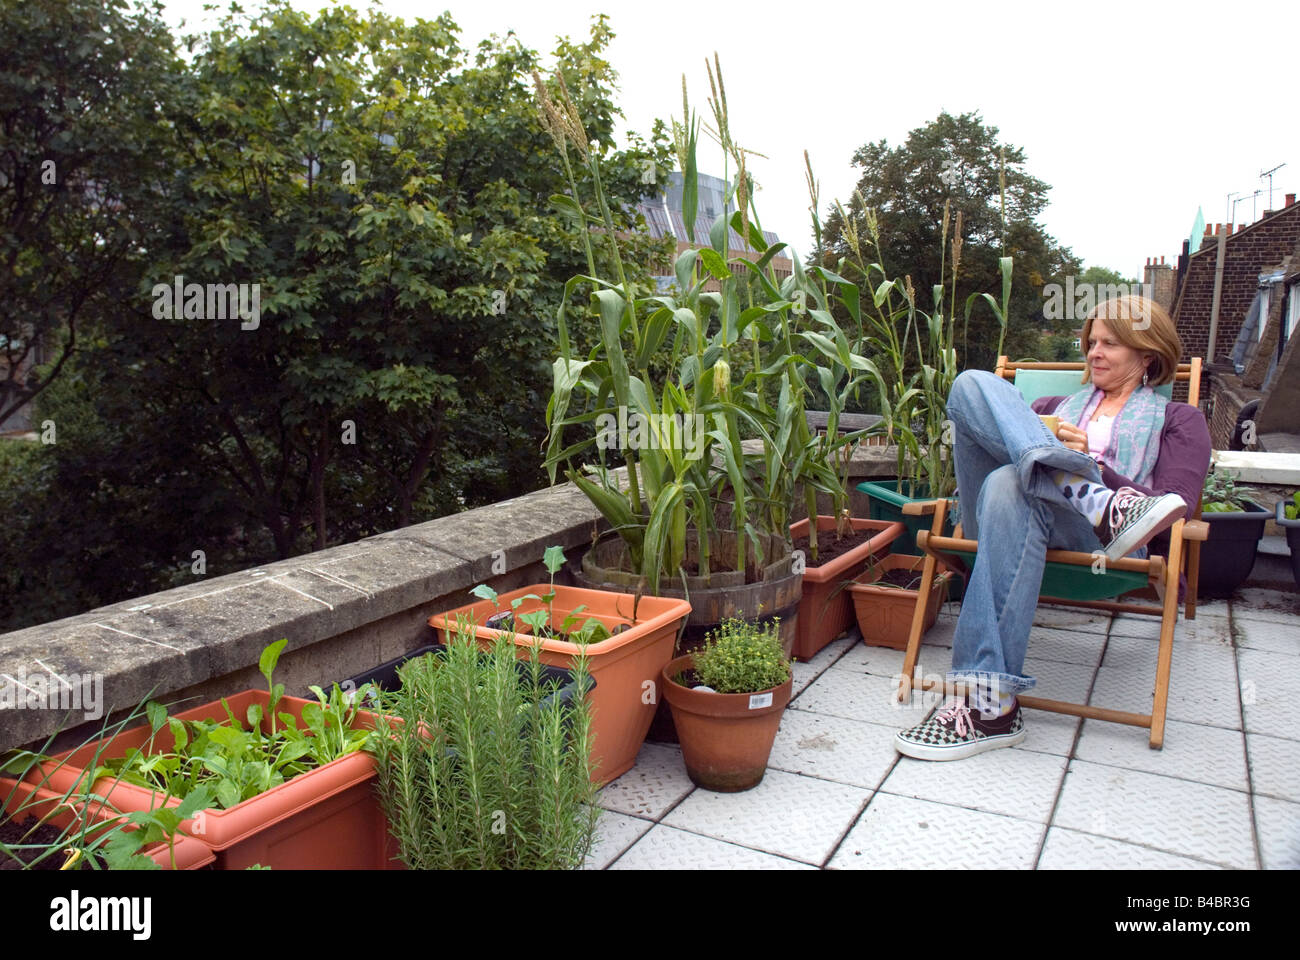 Woman Looking At Vegetables Salads Urban Rooftop Vegetable Garden